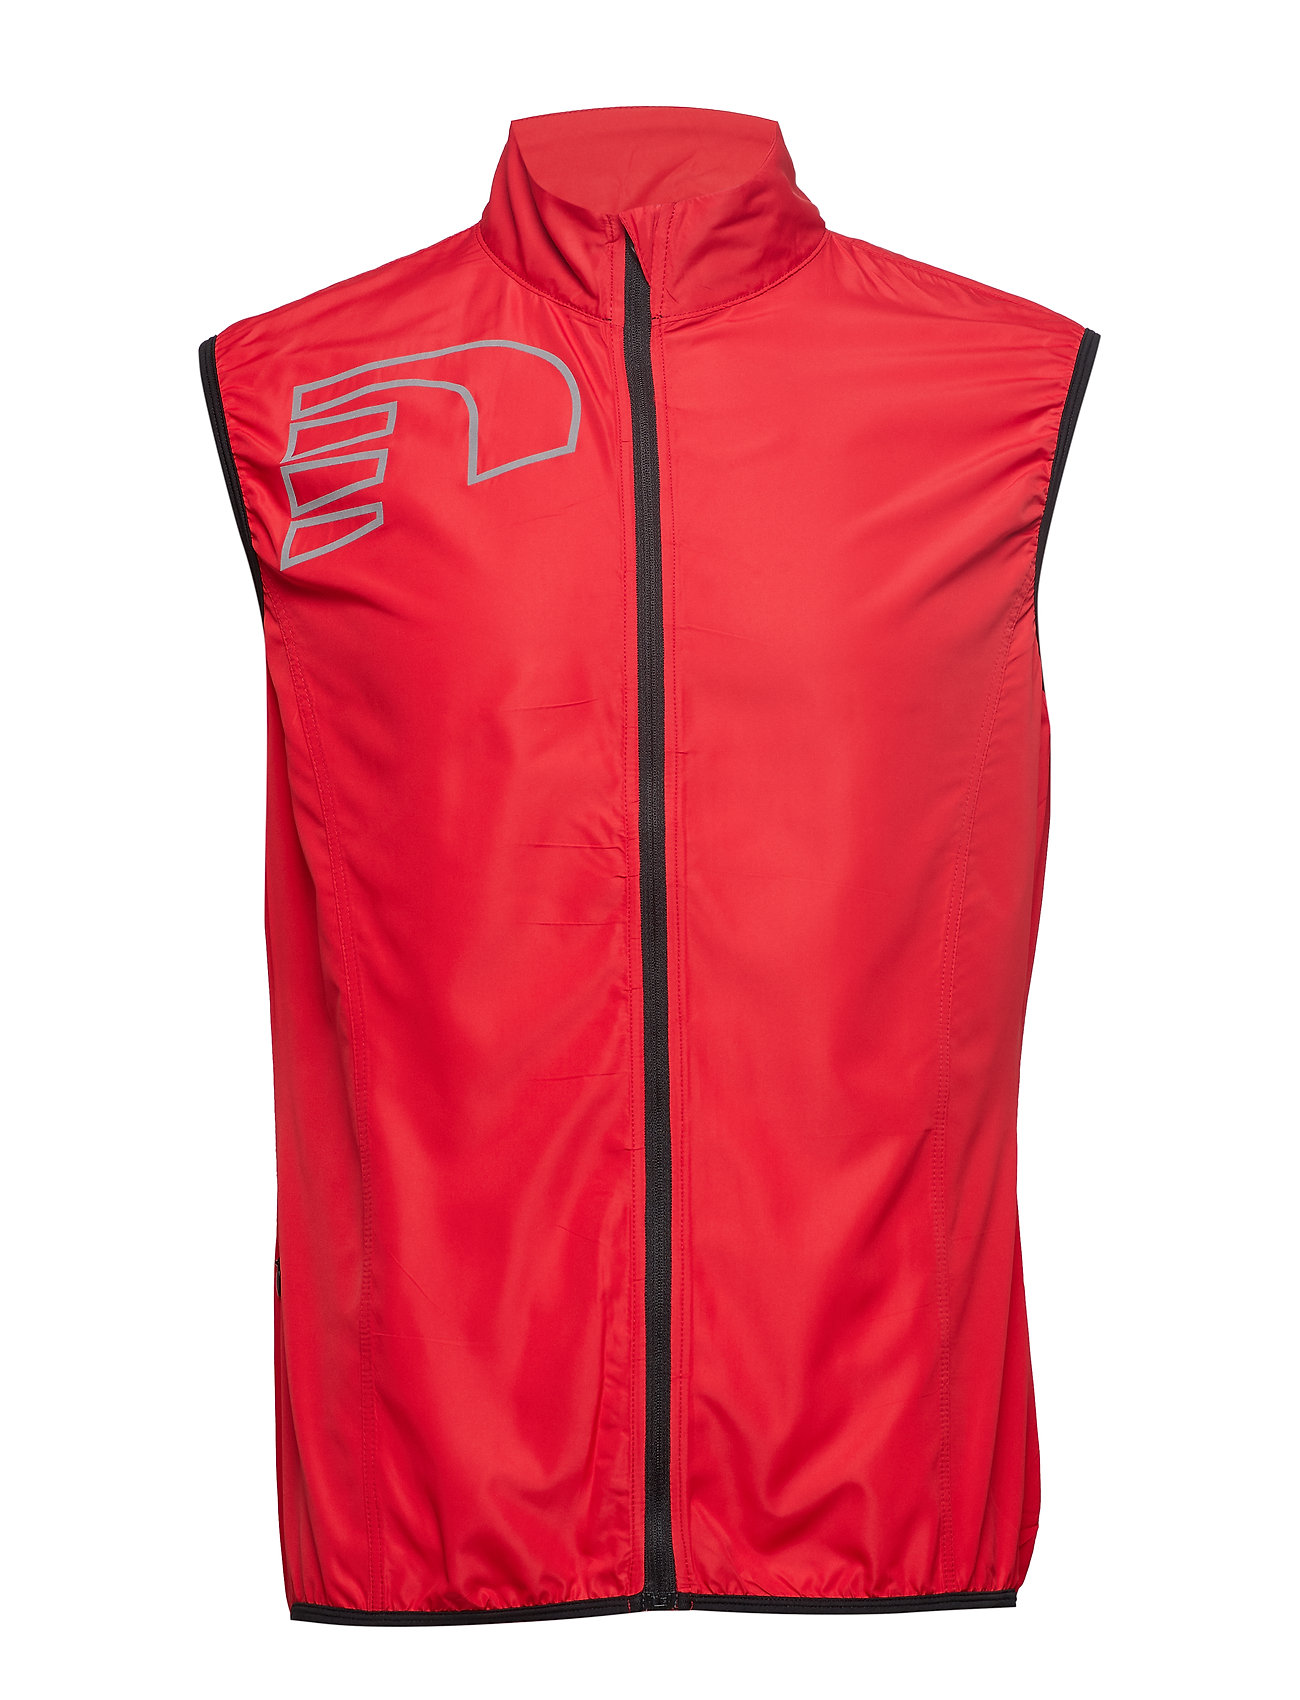 Newline Core Vest - RED